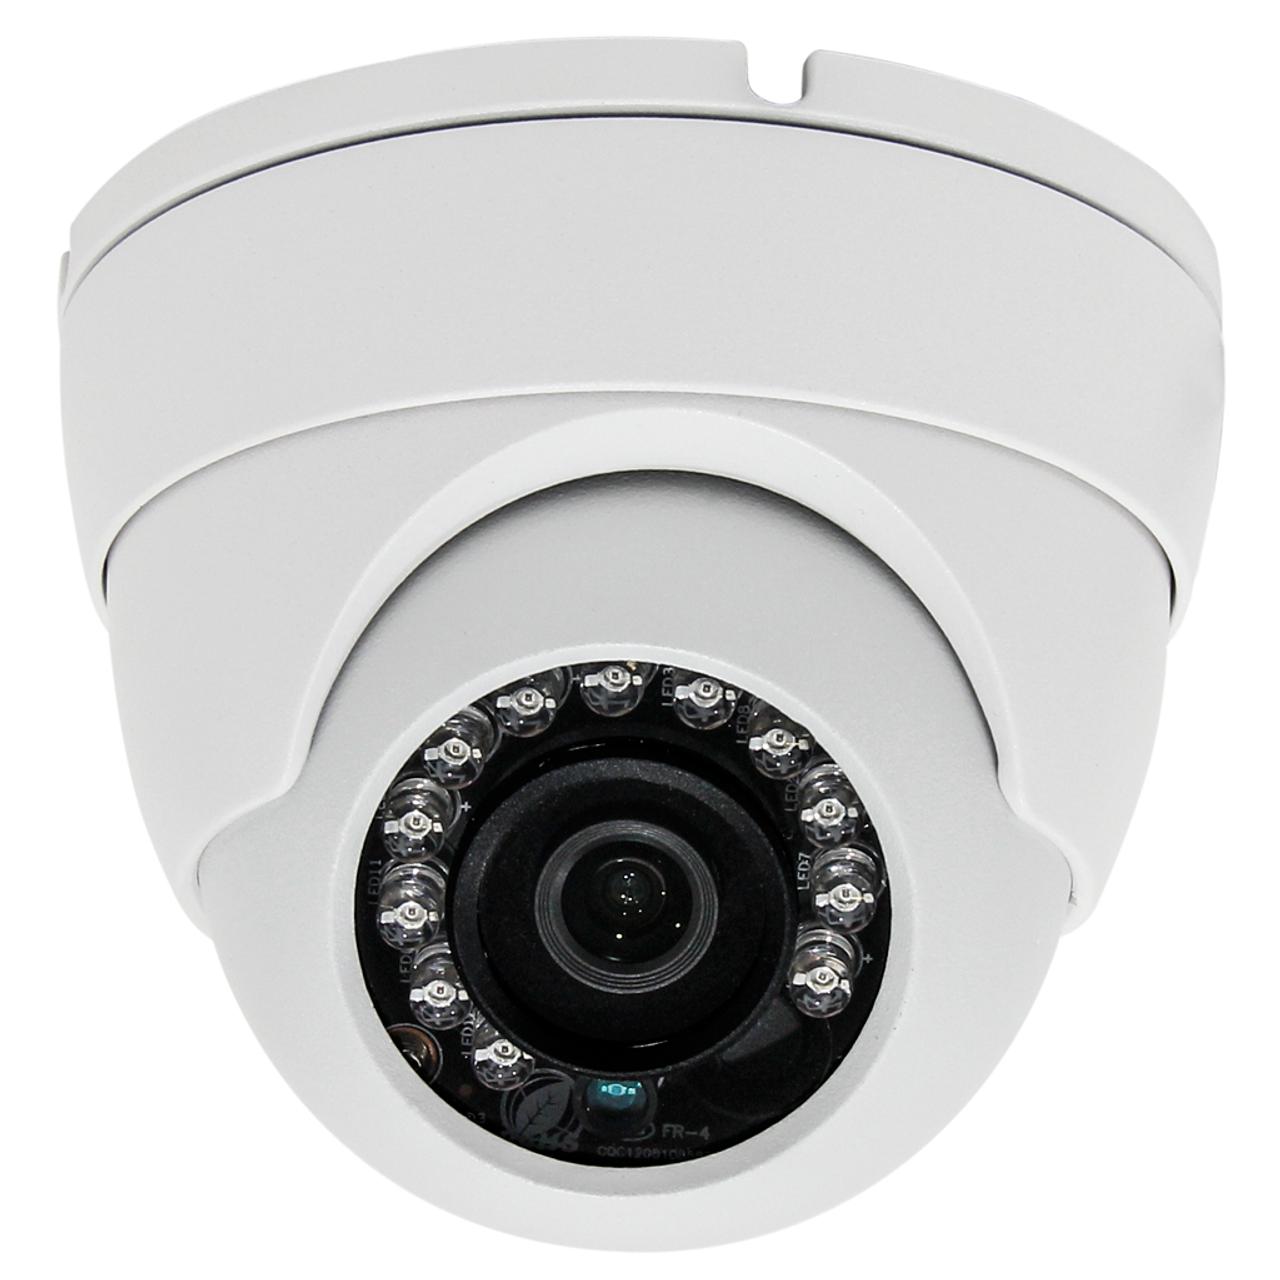 2MP 1080P CCTV Dome Camera HD 4in1 TVI//AHD//CVI//CVBS Wide View Angle Infrared Cam